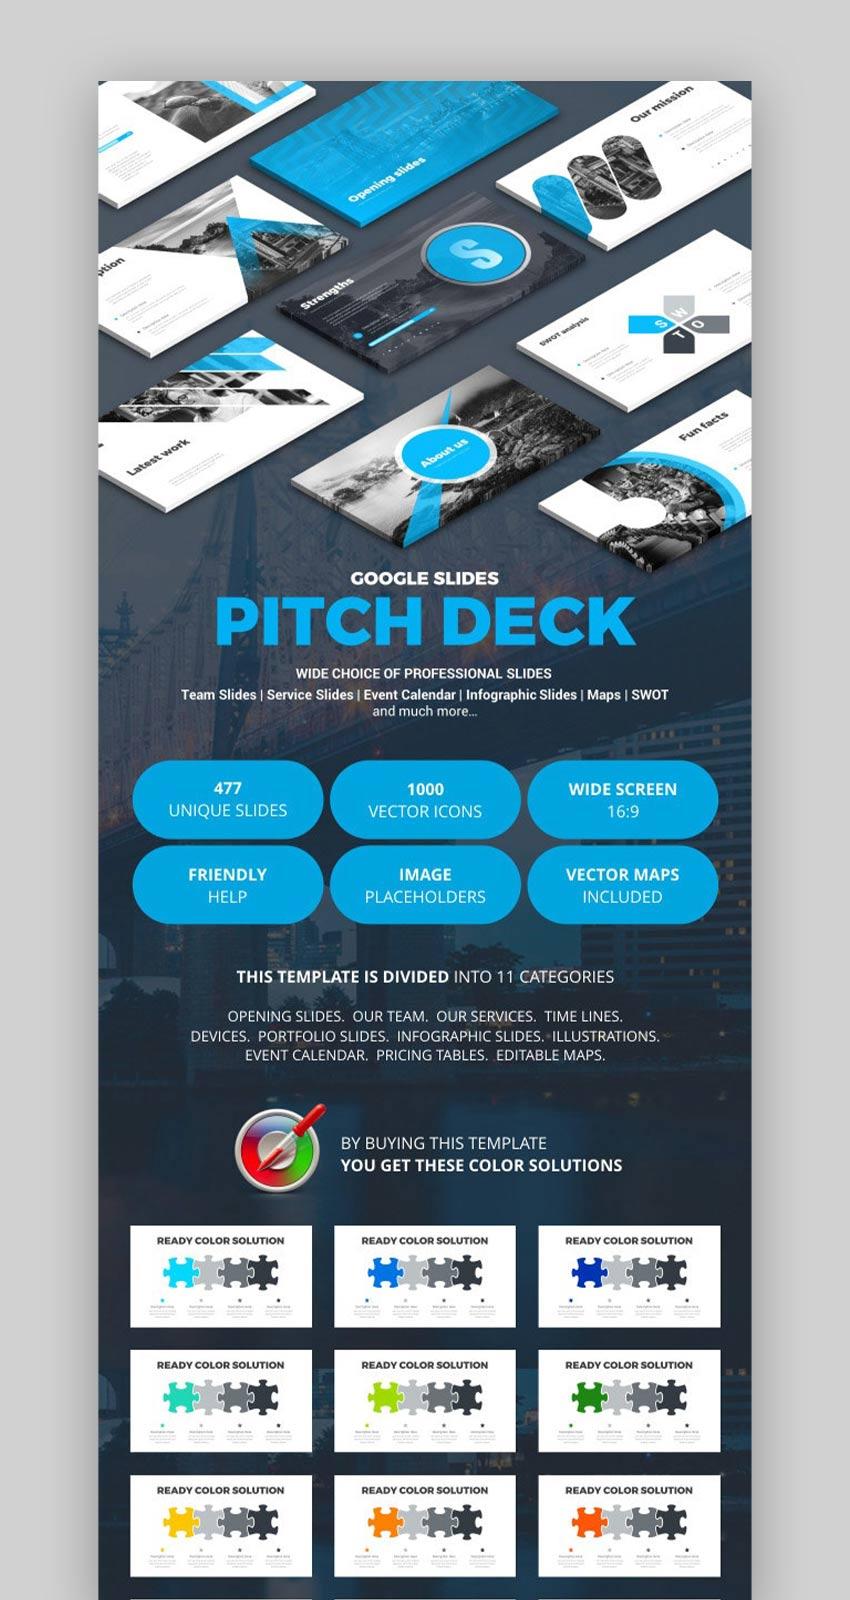 Pitch Deck Google Slides